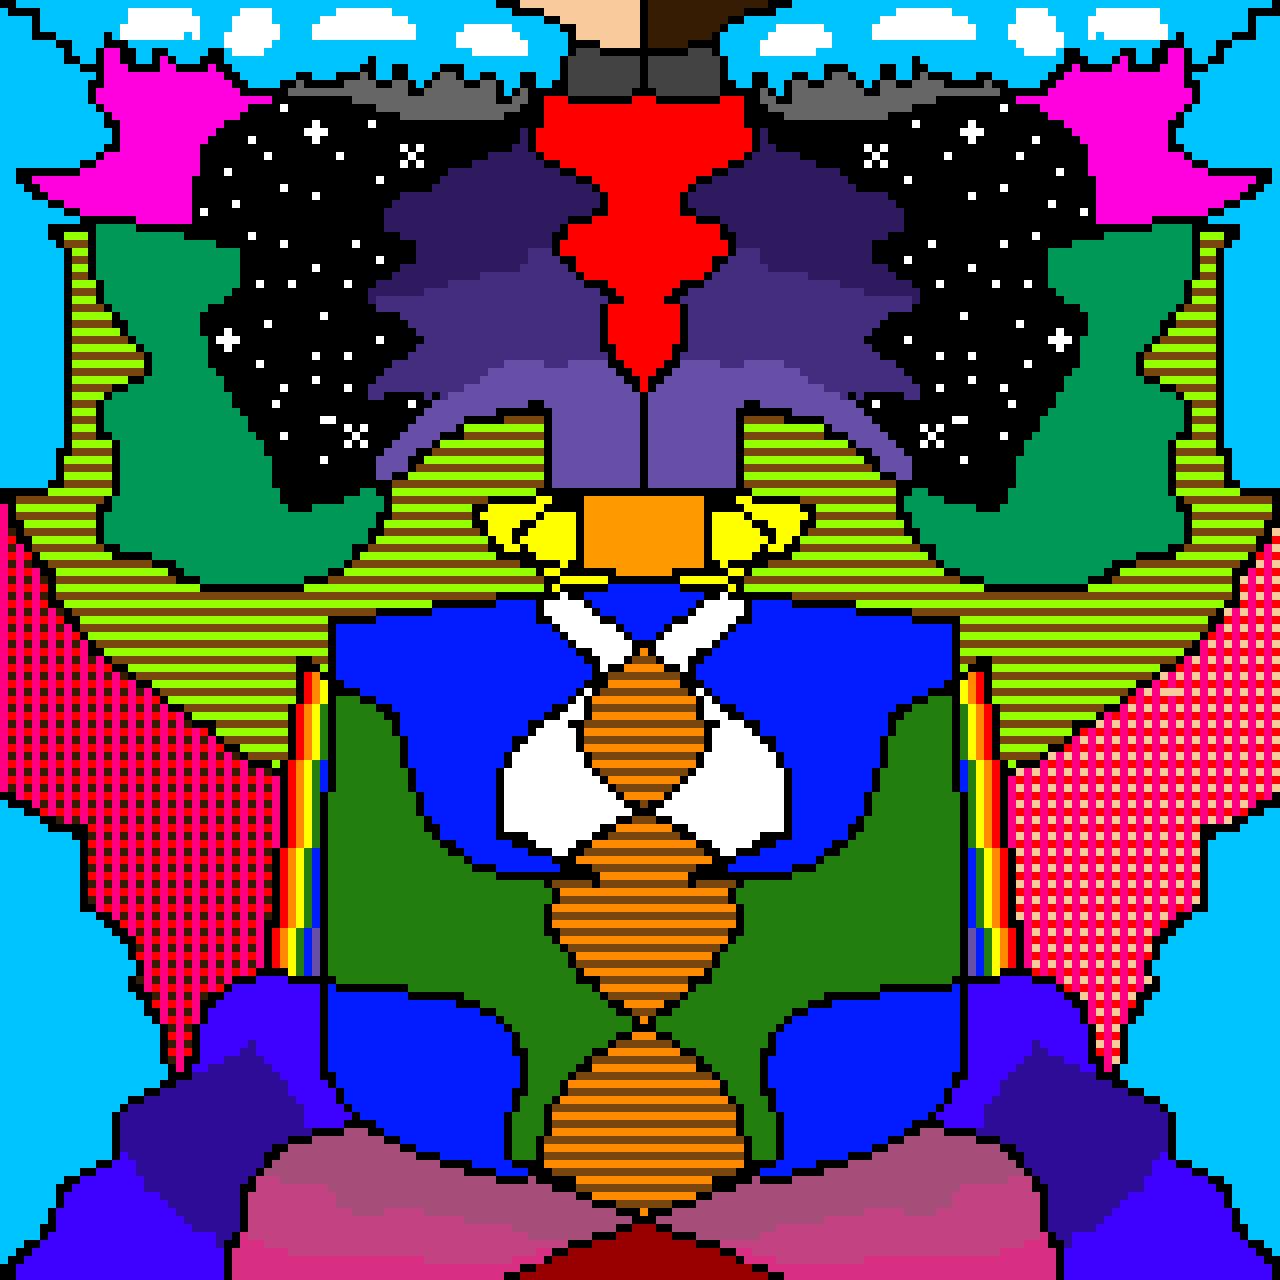 Mr. Creation